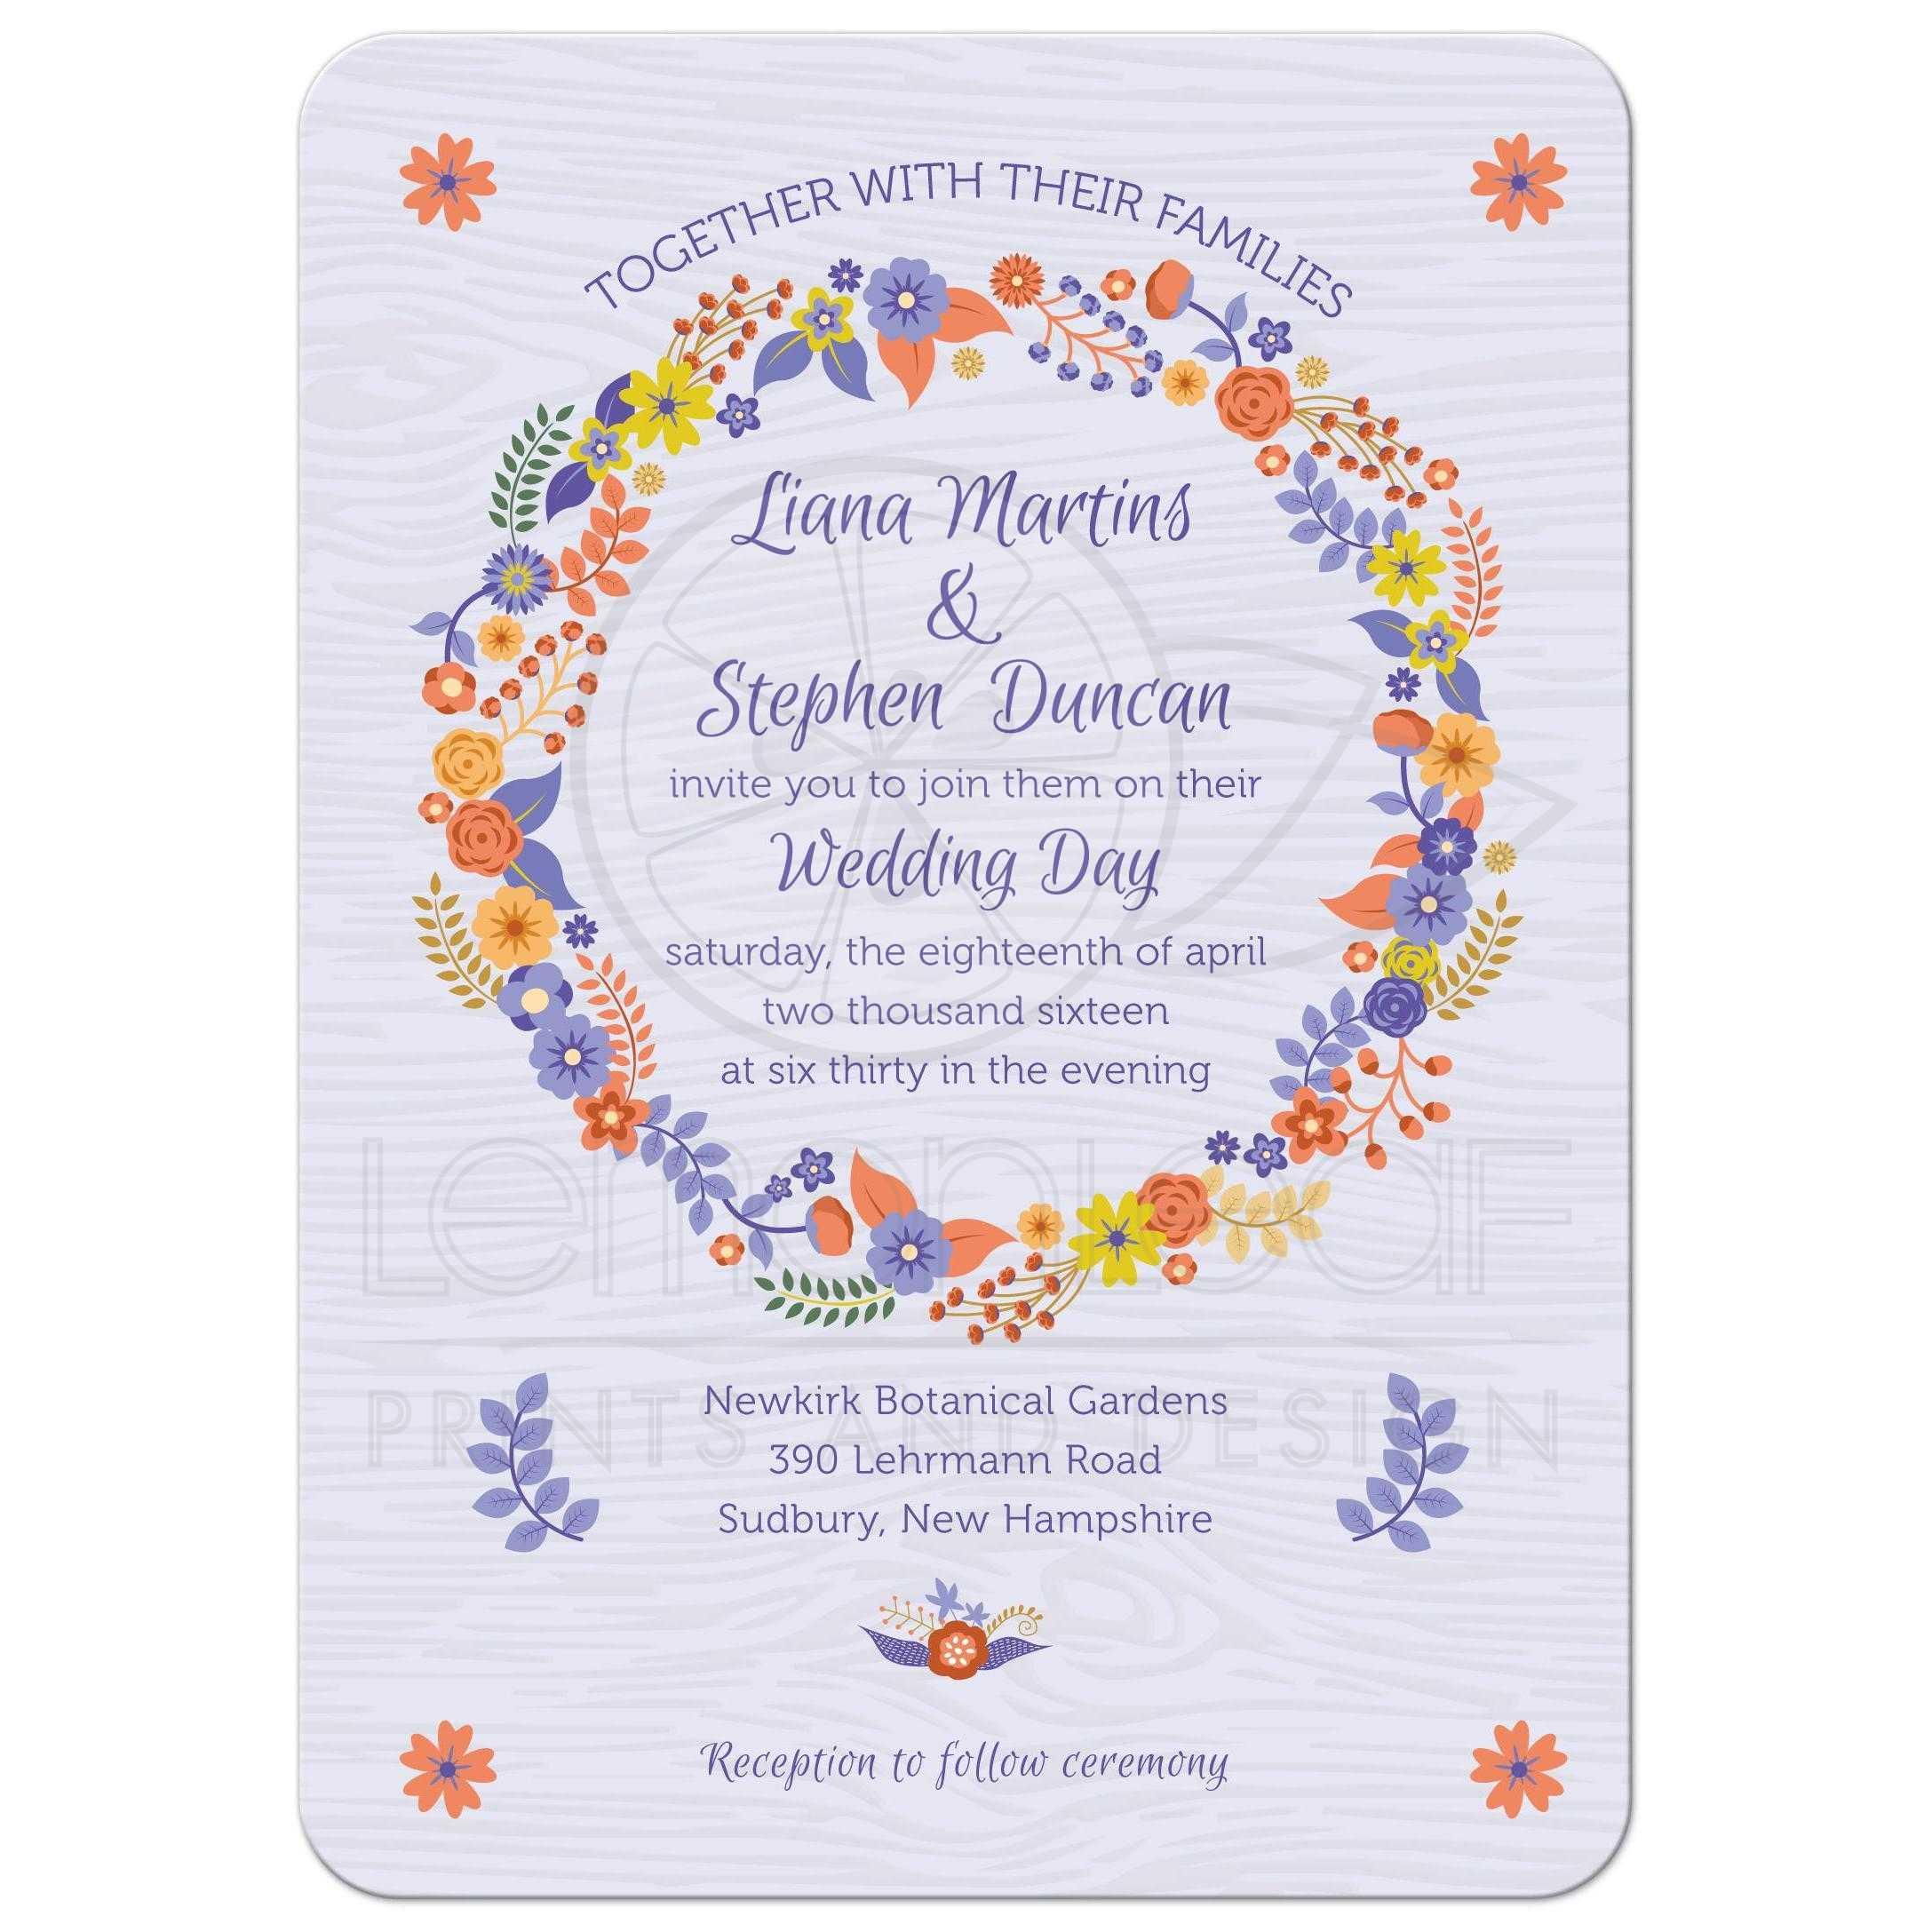 Purple Rustic Wedding Invitations: Rustic Purple Wood Grain Floral Wreath